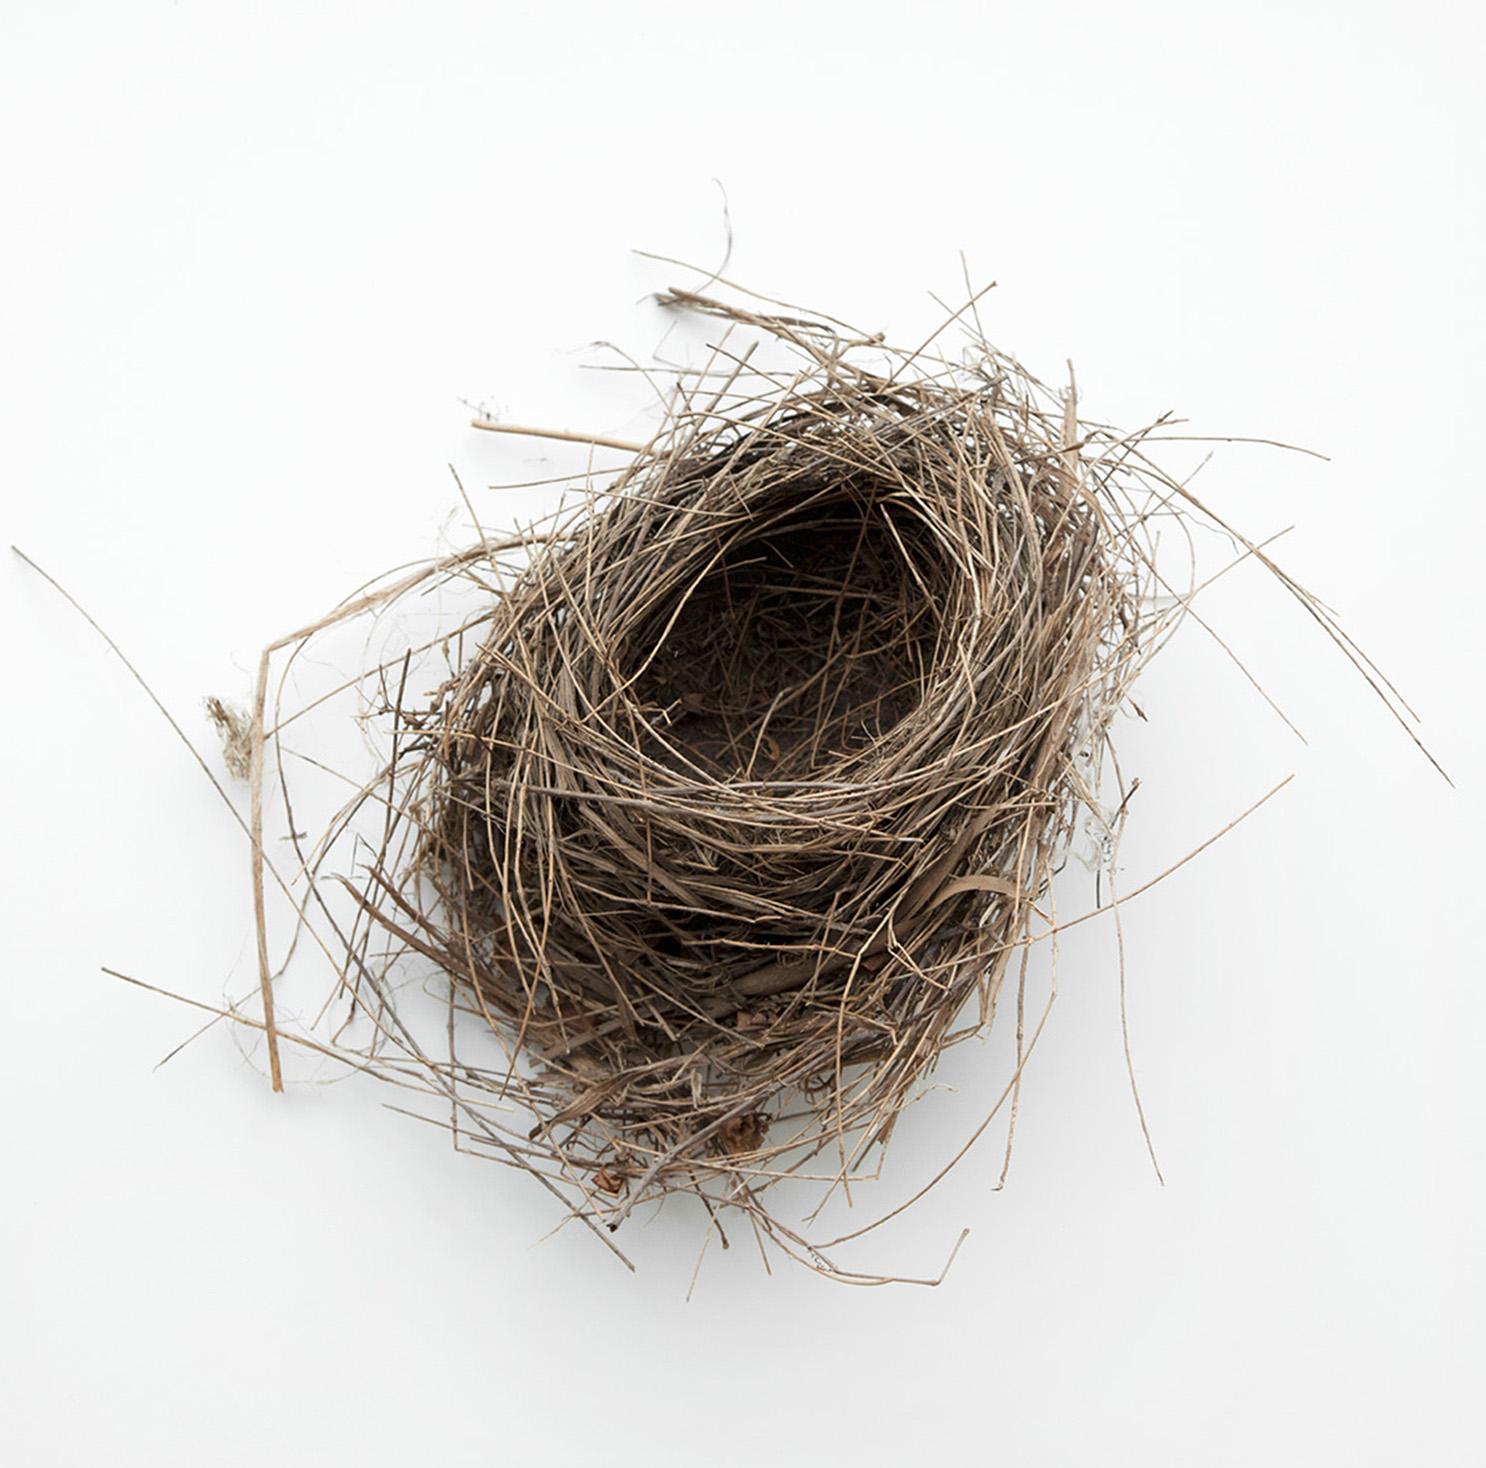 Nest #2569, 2017, archival pigment print, 10 x 10 in, $950; 16 x 16 in, $1,500